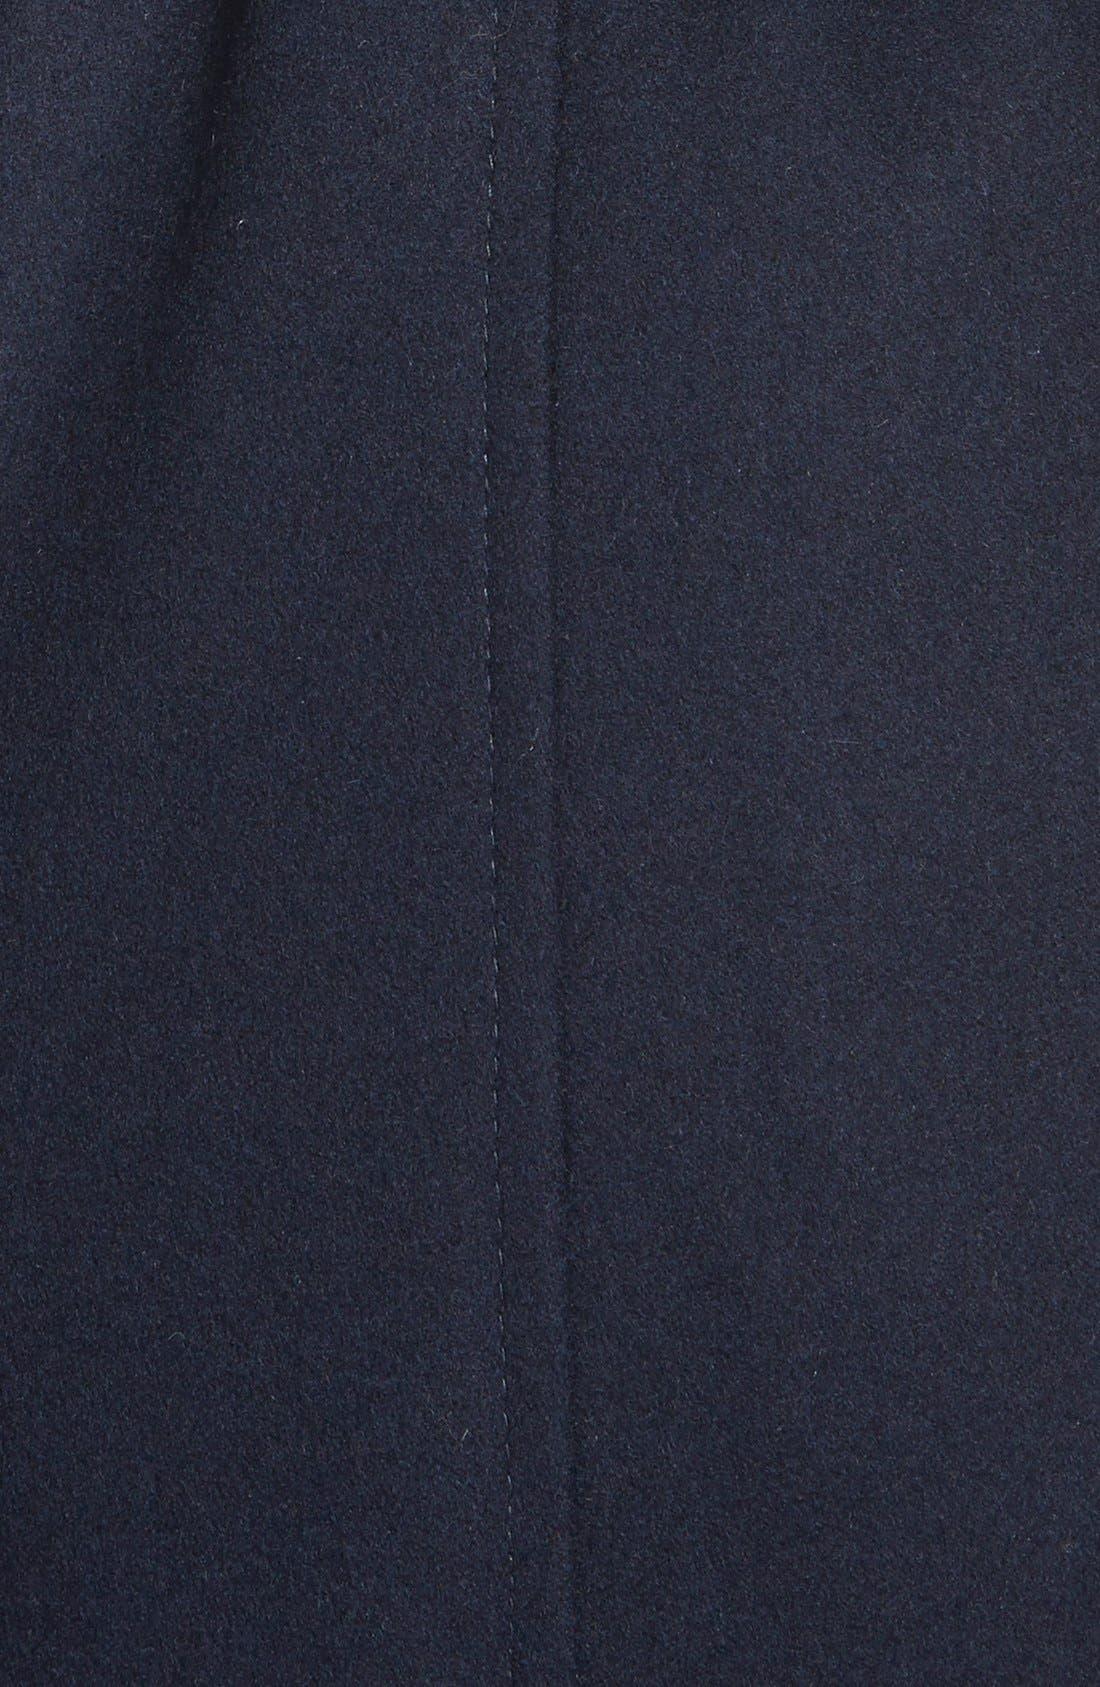 Alternate Image 3  - Via Spiga Faux Leather & Faux Fur Trim Belted Wool Blend Coat